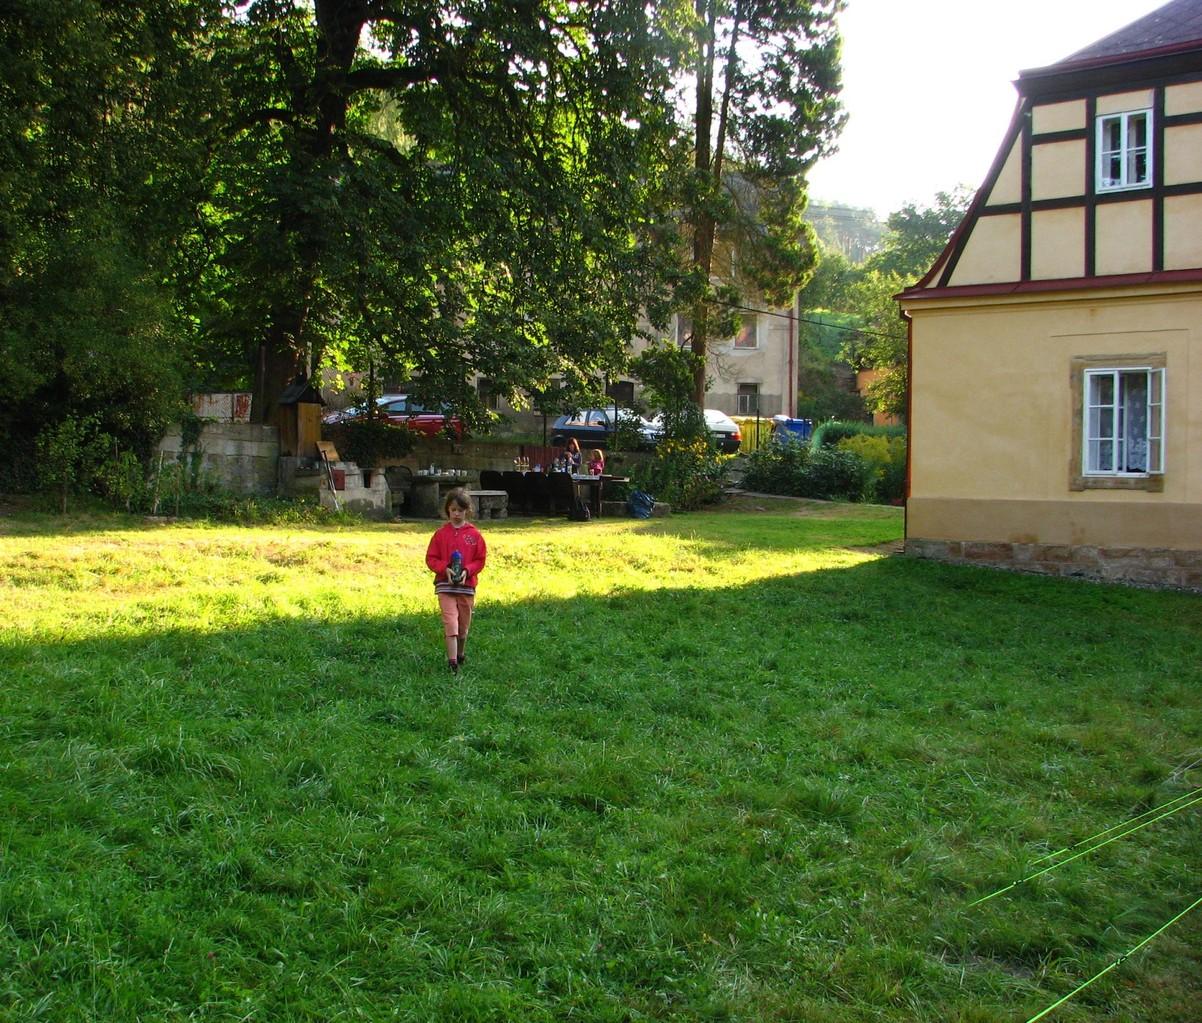 3.Tag früh Morgens, das Grass ist noch nass...